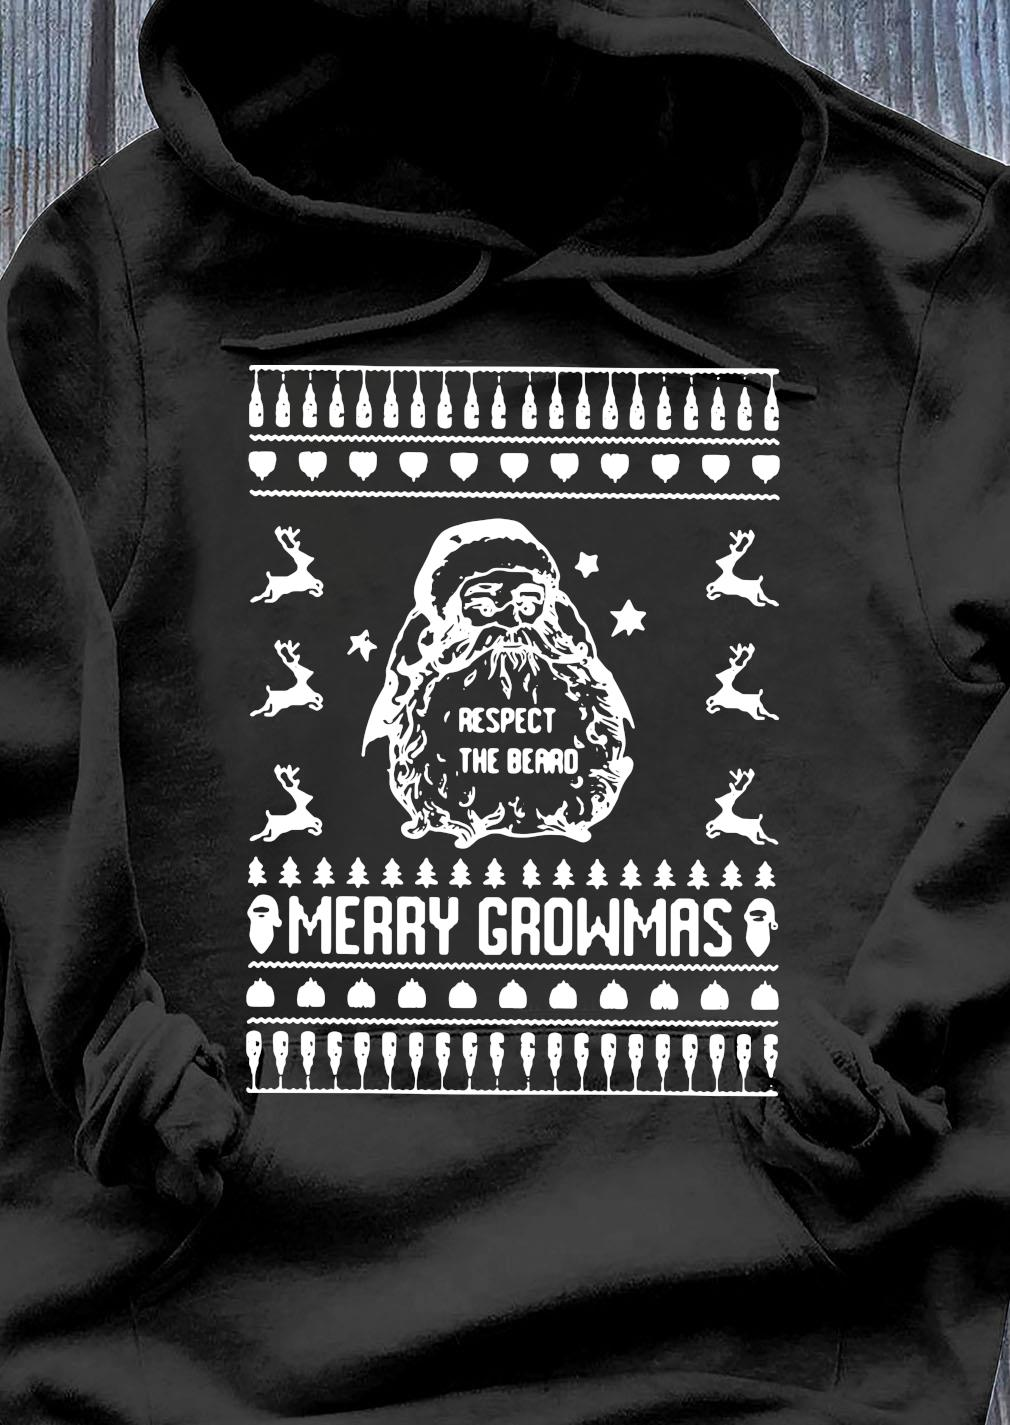 Sata Respect The Beard Ugly Merry Growmas Ugly Sweats Hoodie